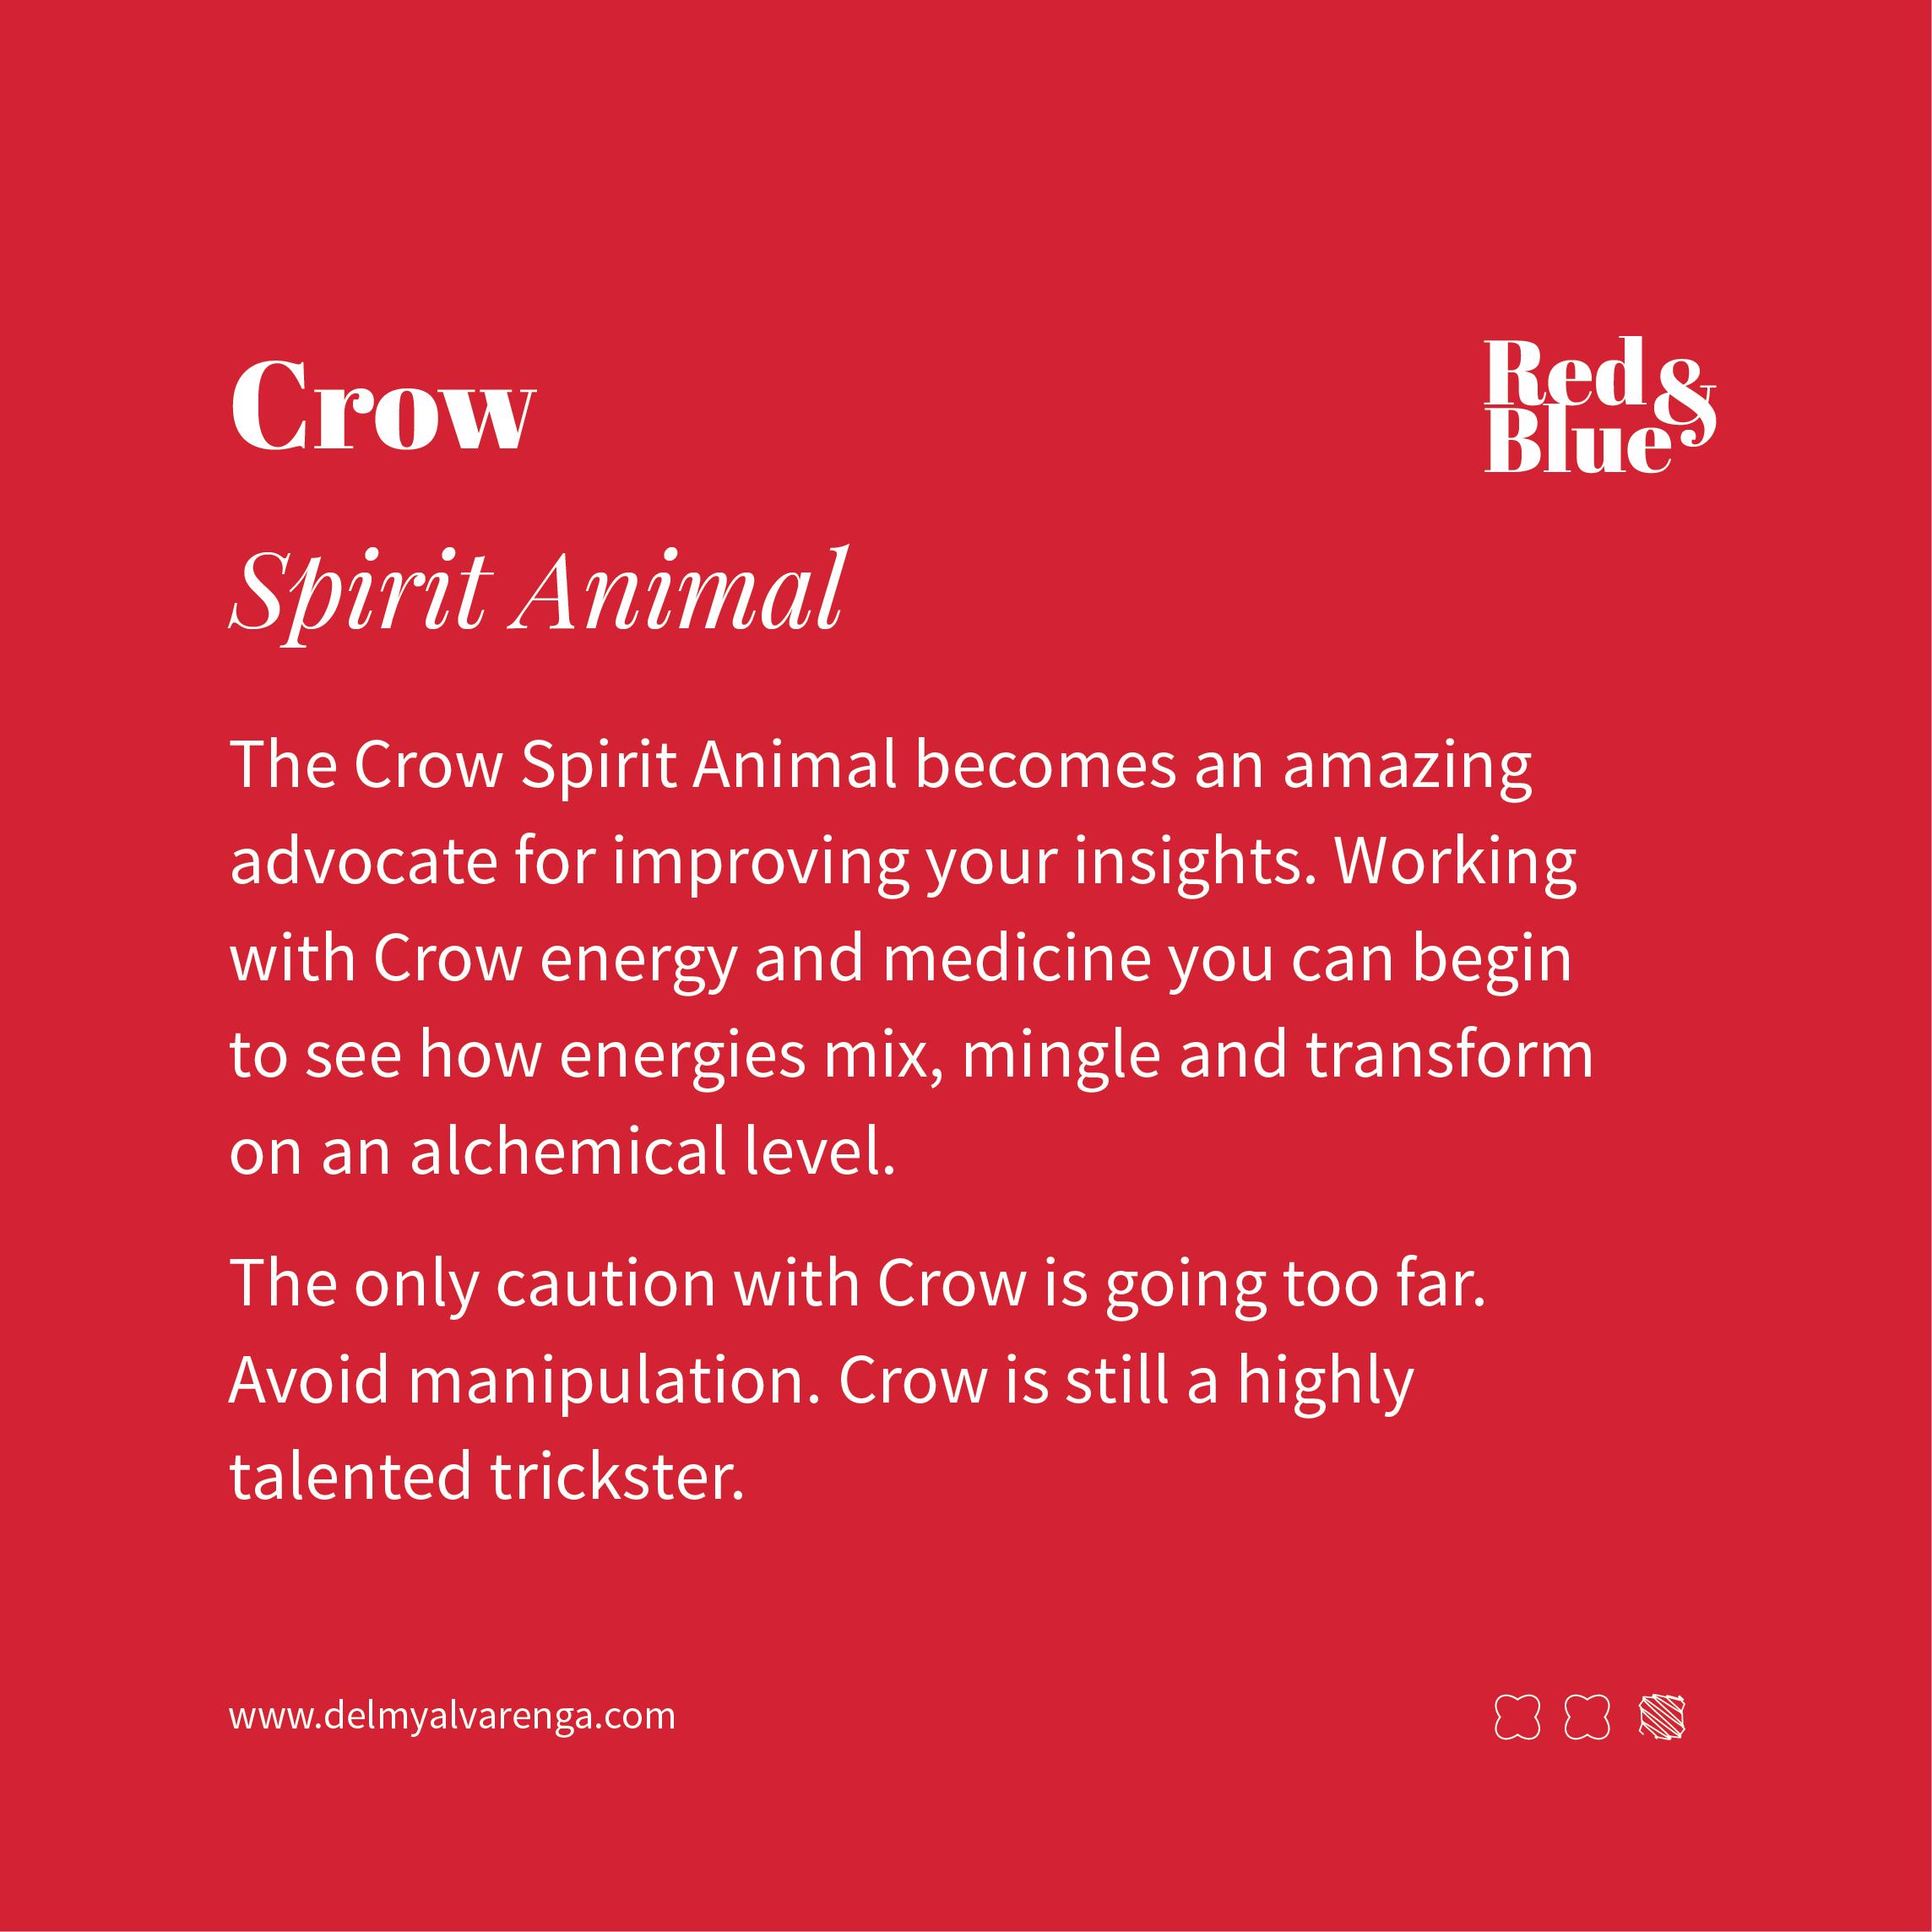 Crow Spirit Animal